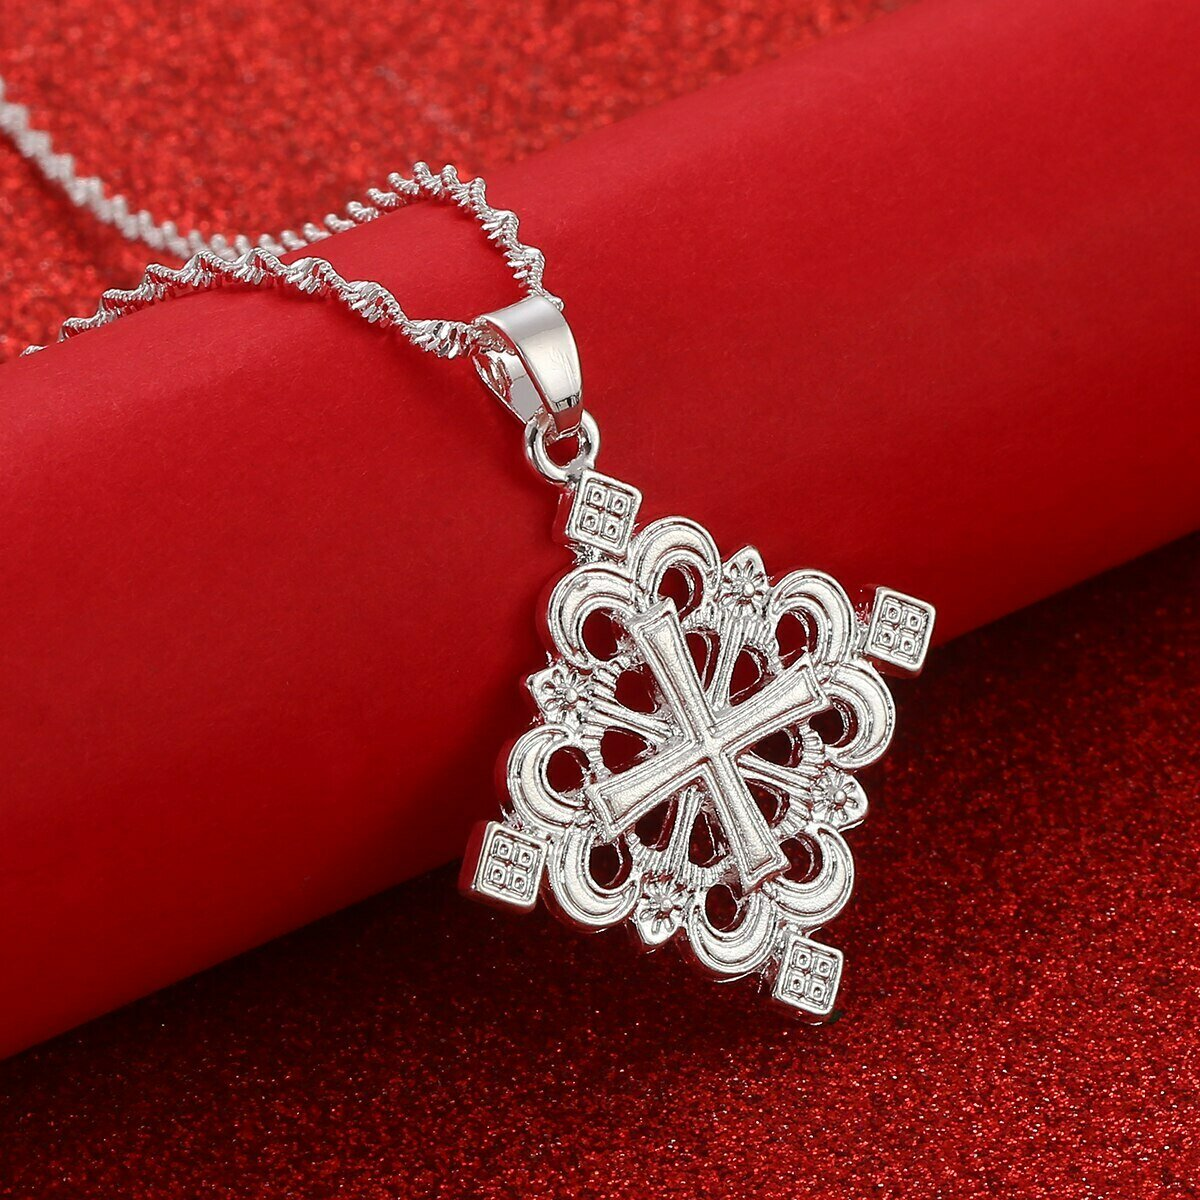 Ethiopian Cross Pendant Necklaces for Women Eritrea Jewelry Africa Ethnic Crosses